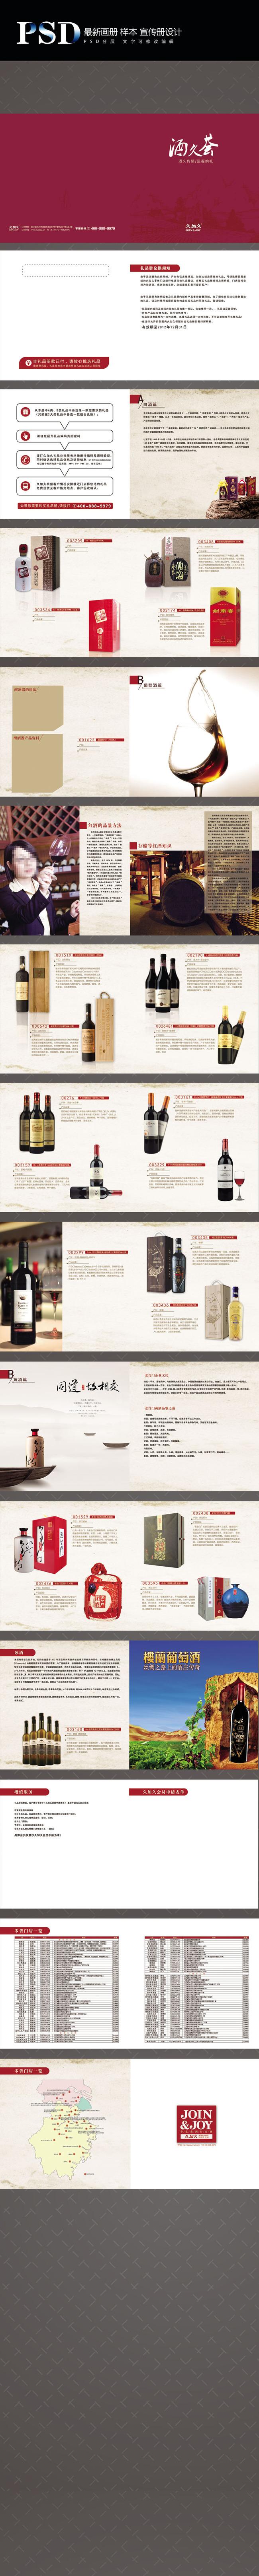 【psd】酒类产品画册设计模板psd源文件